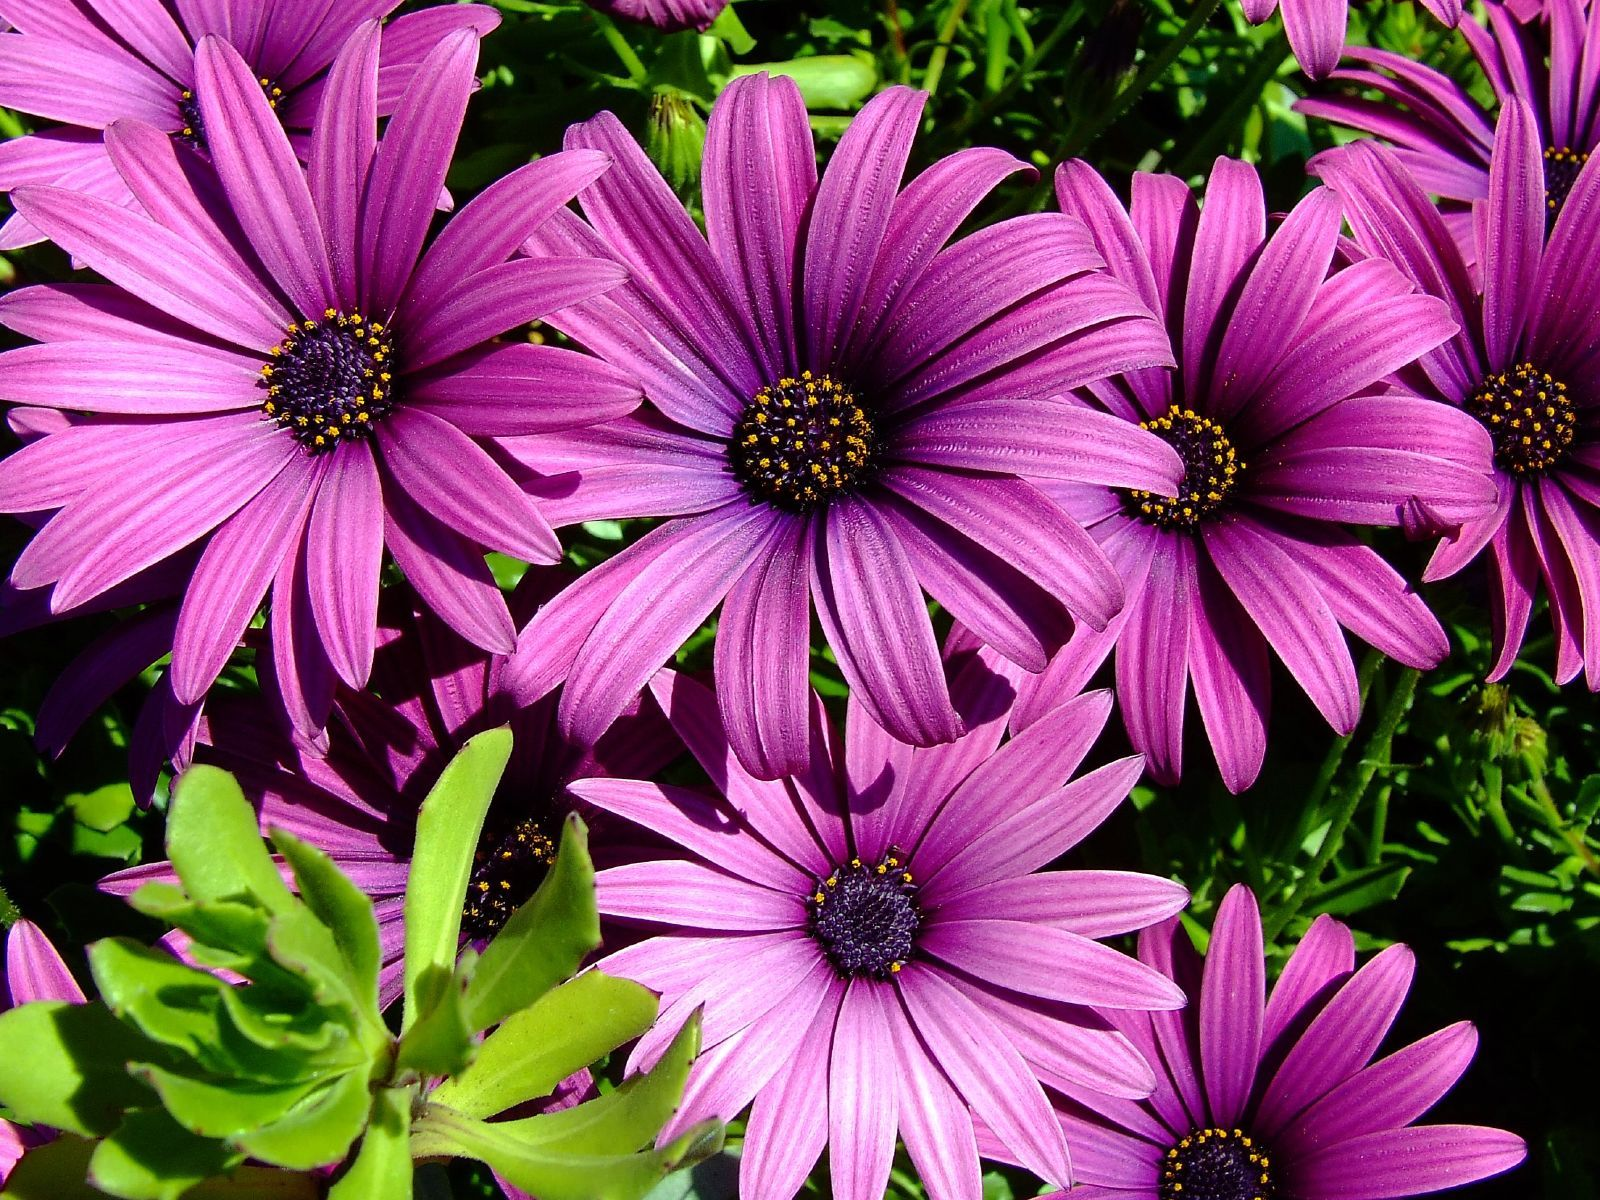 Types of purple flowers purple daisy tattoo ideas pinterest types of purple flowers purple daisy izmirmasajfo